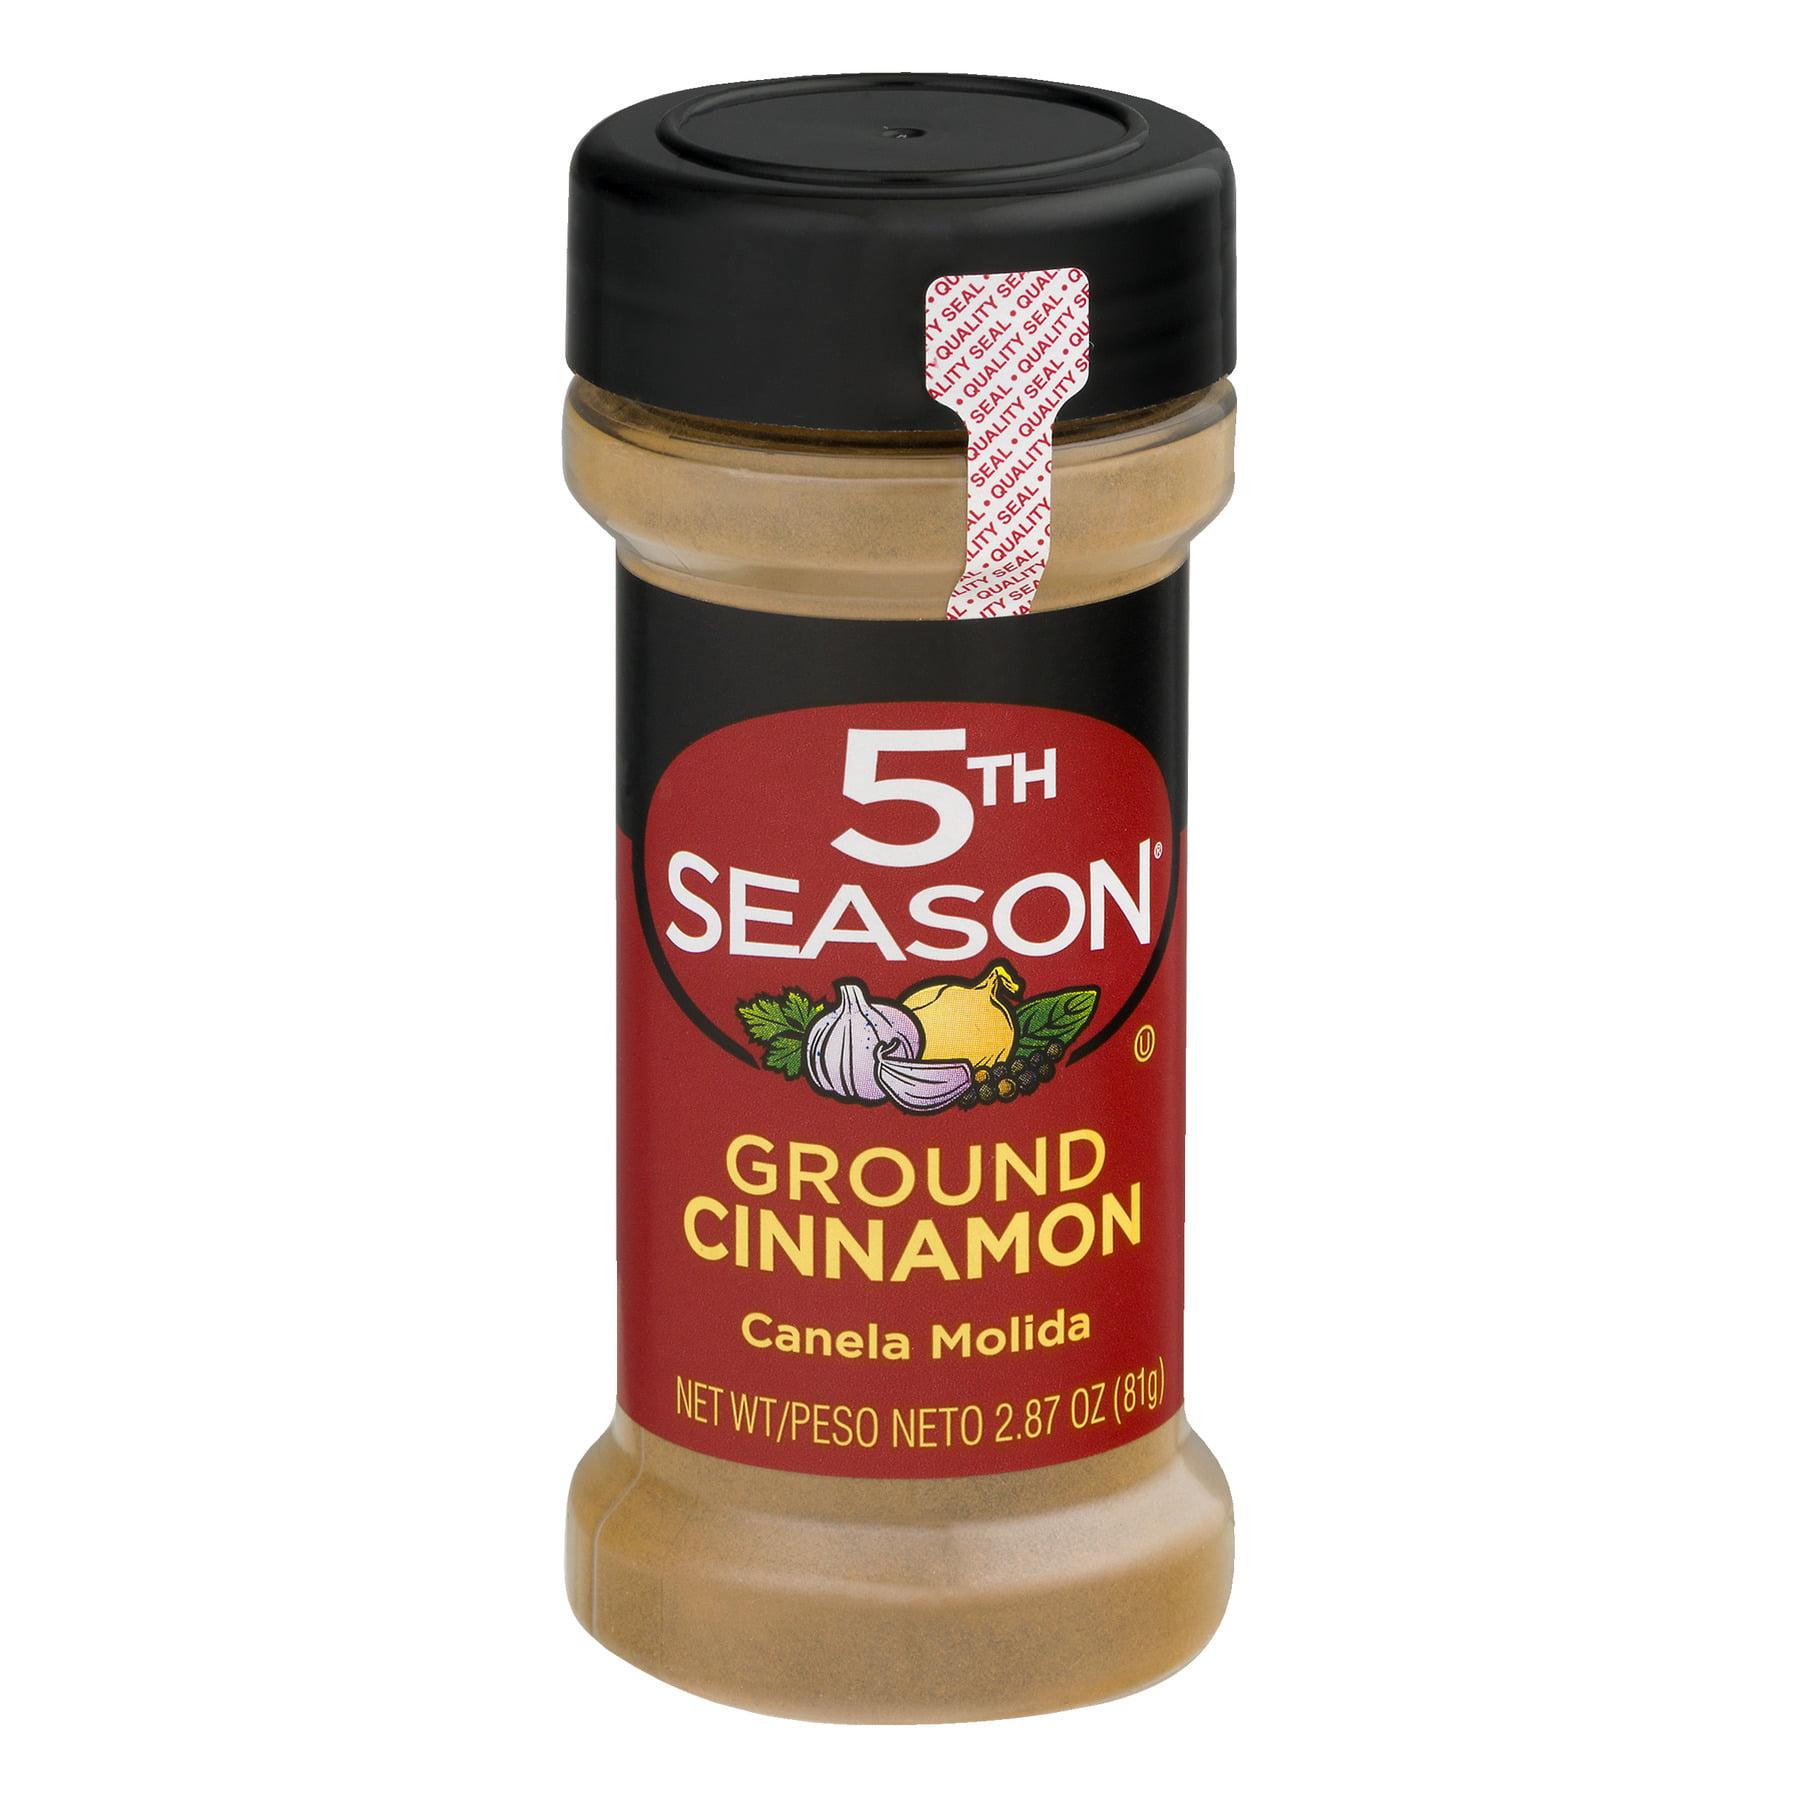 Image of 5TH Season Ground Cinnamon, 2.87 OZ